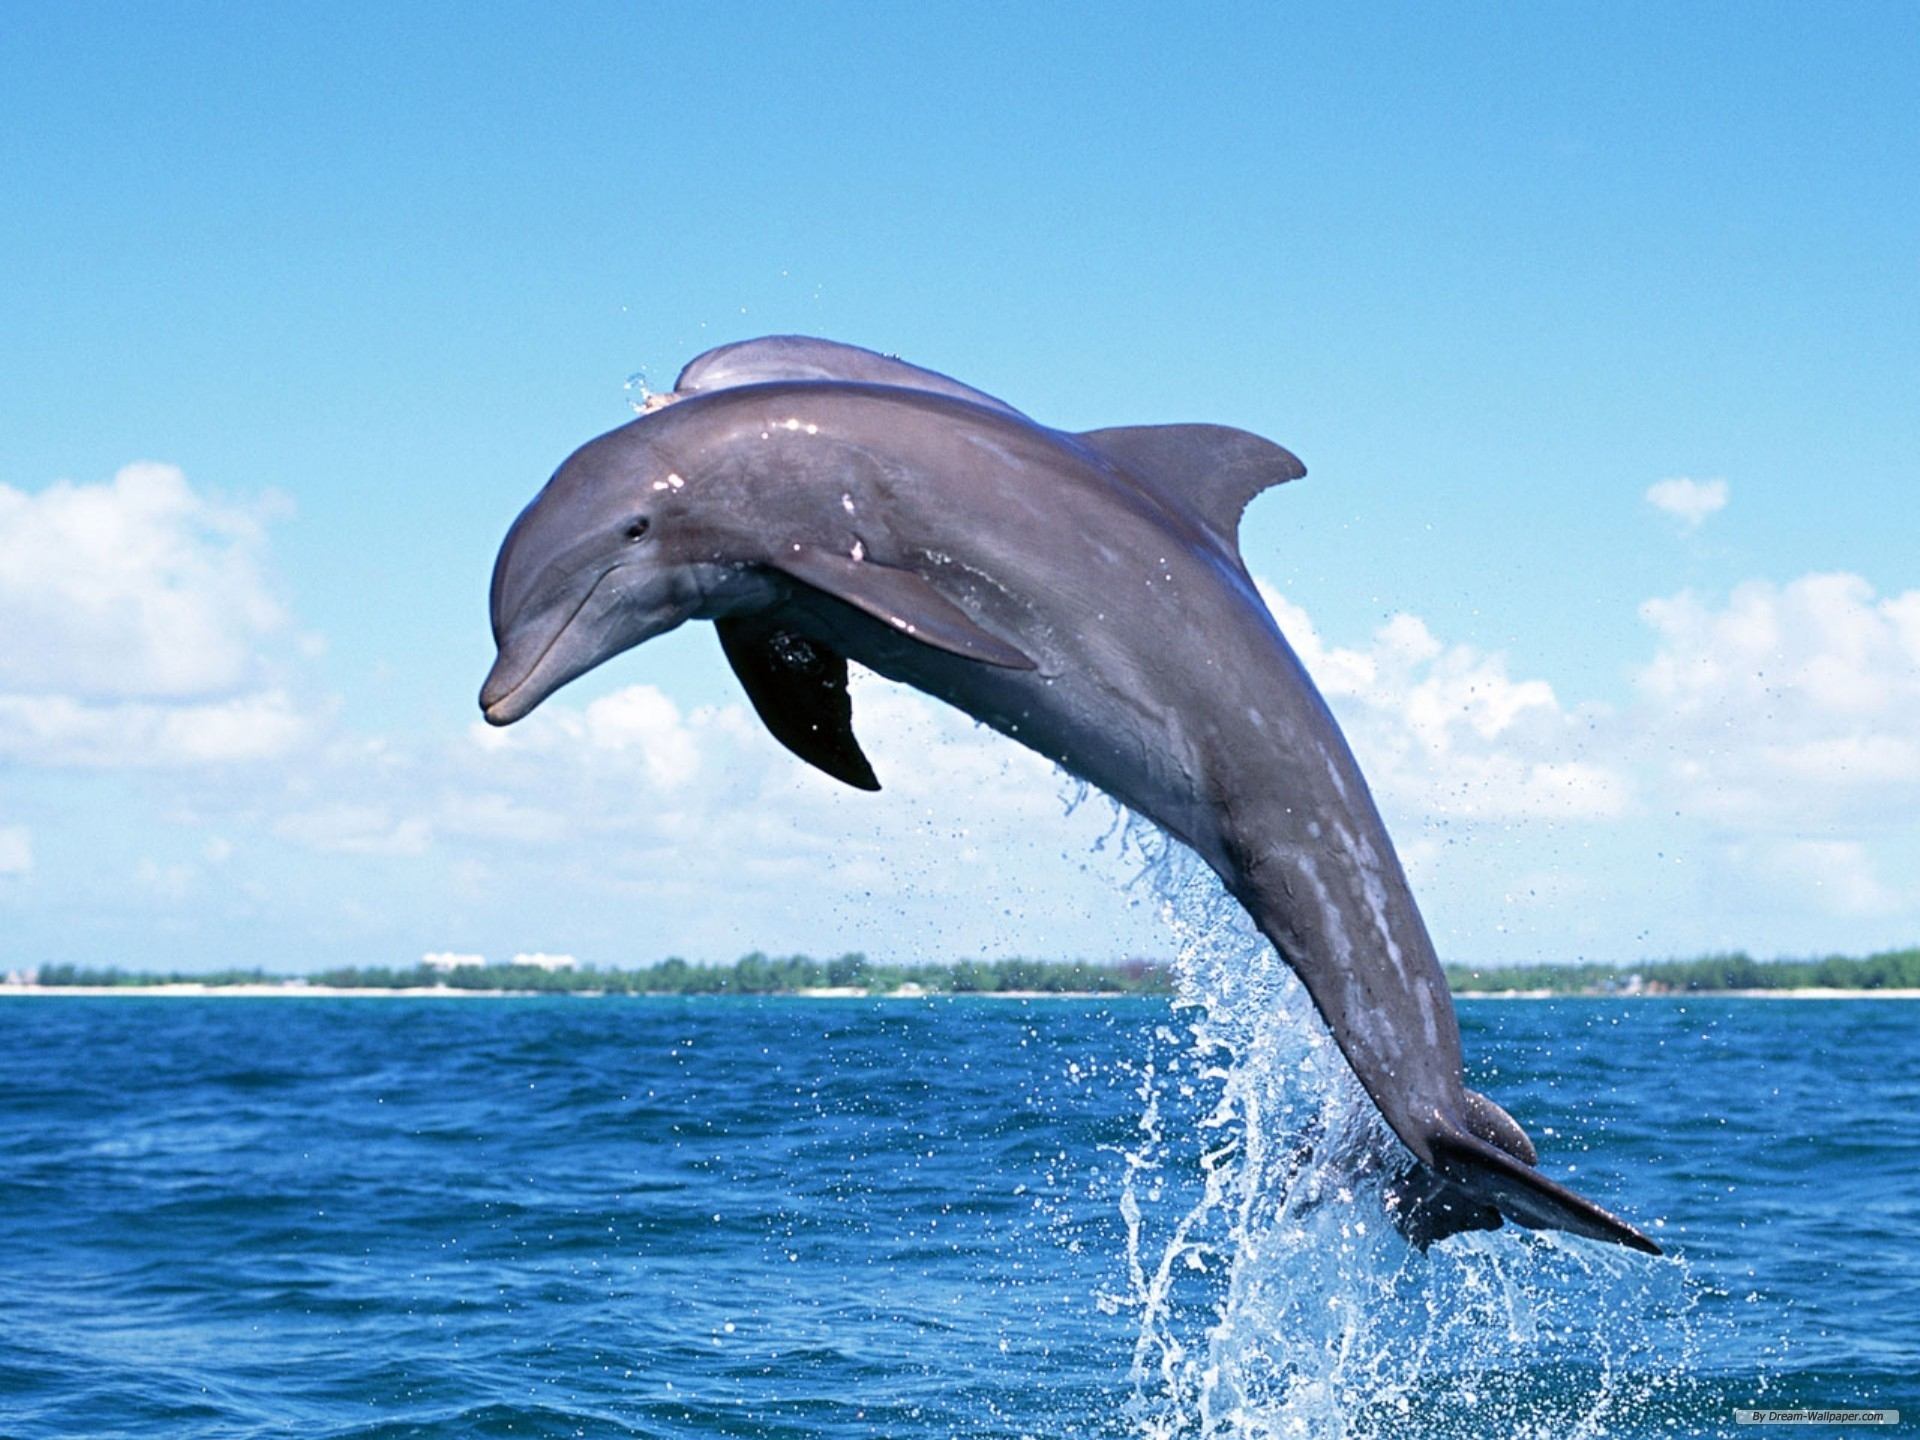 free wallpaper - free animal wallpaper - dolphin wallpaper